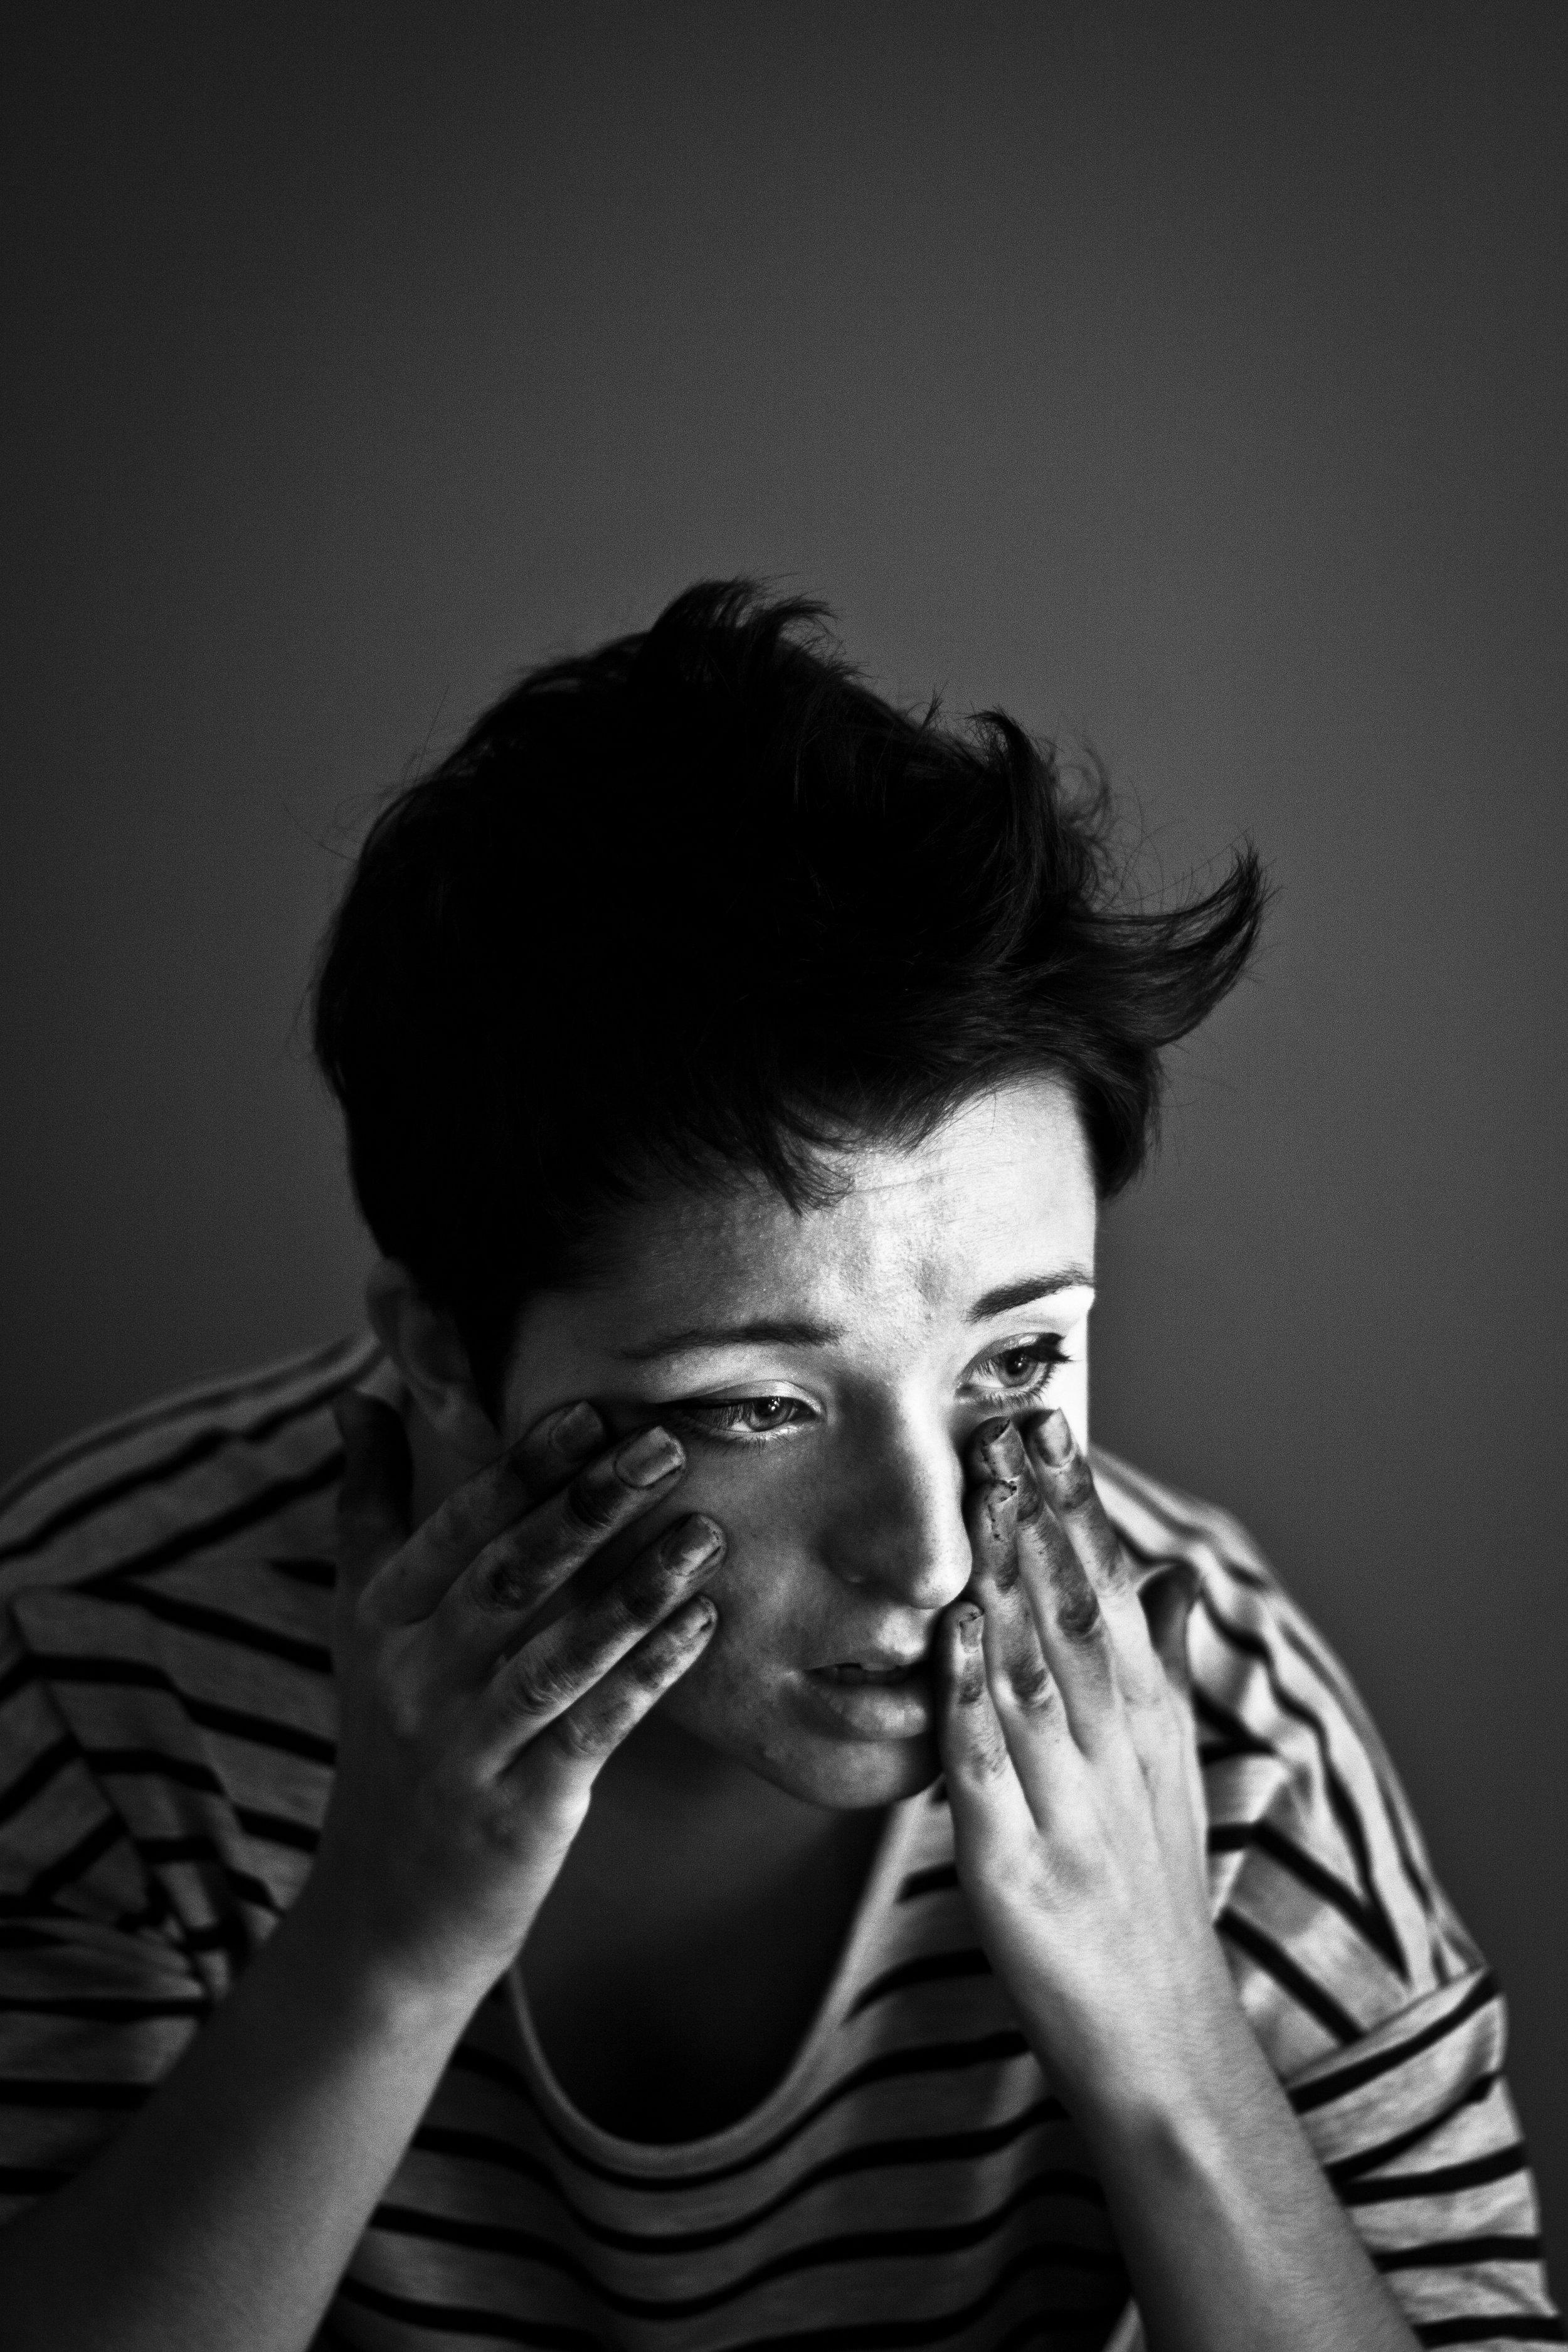 creative-personal-portraits-katy-daixon-photography11.jpg